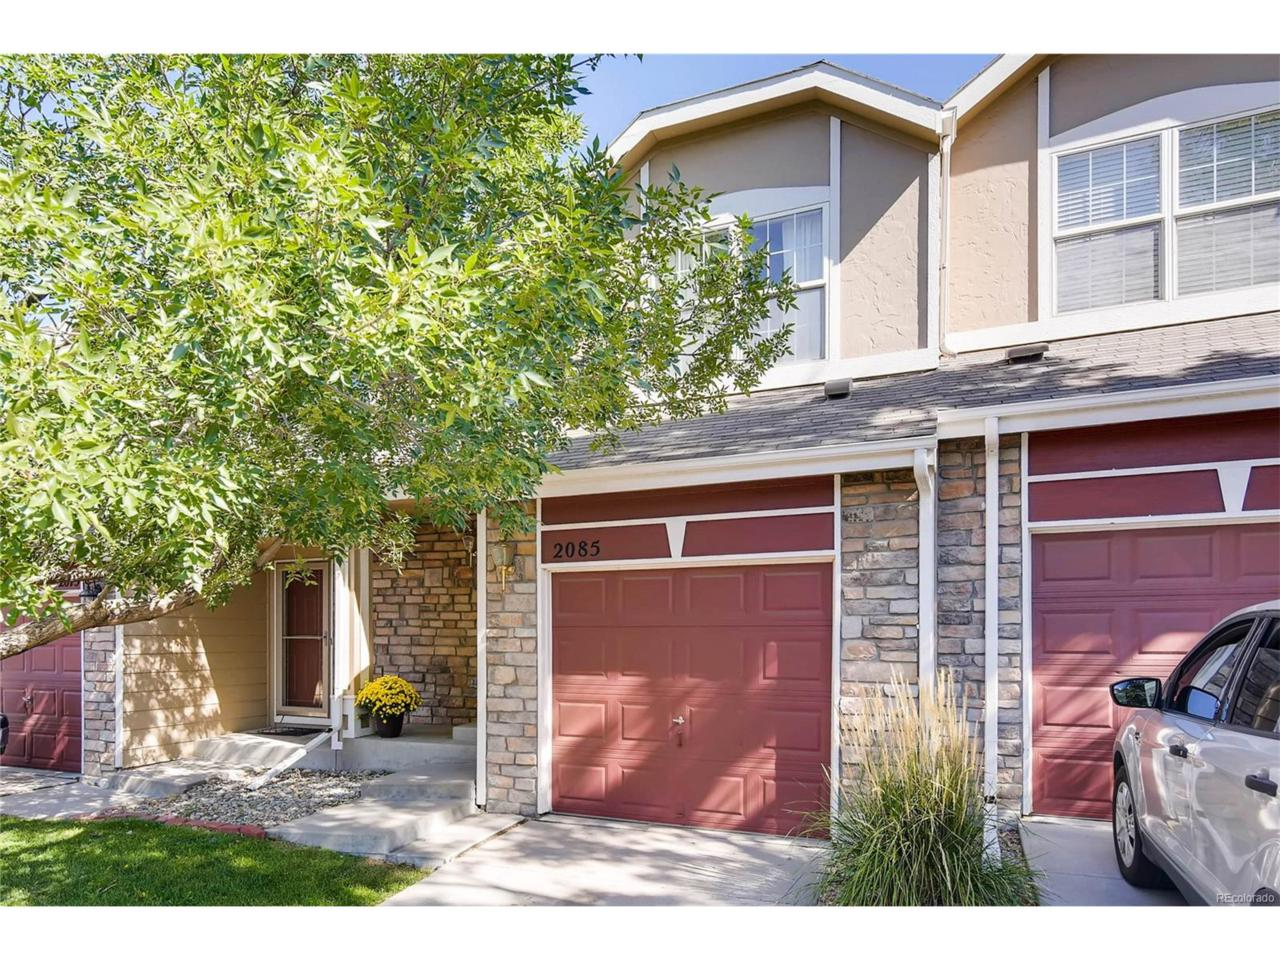 2085 E 103rd Avenue, Thornton, CO 80229 (MLS #7615156) :: 8z Real Estate